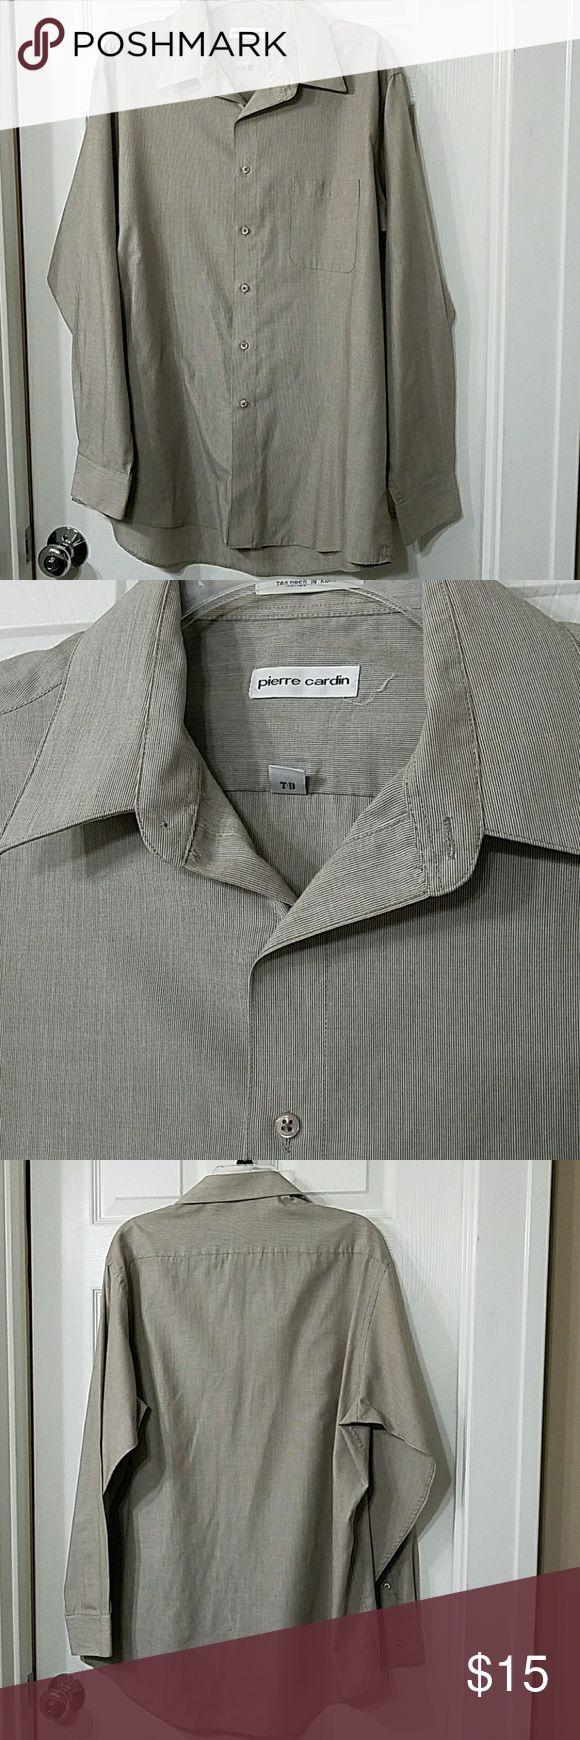 Pierre Cardin Dress Shirt EUC. 65%polyester, 35% cotton. Khaki/taupe in color. Size16-16 1/2, 34/35 Pierre Cardin Shirts Dress Shirts